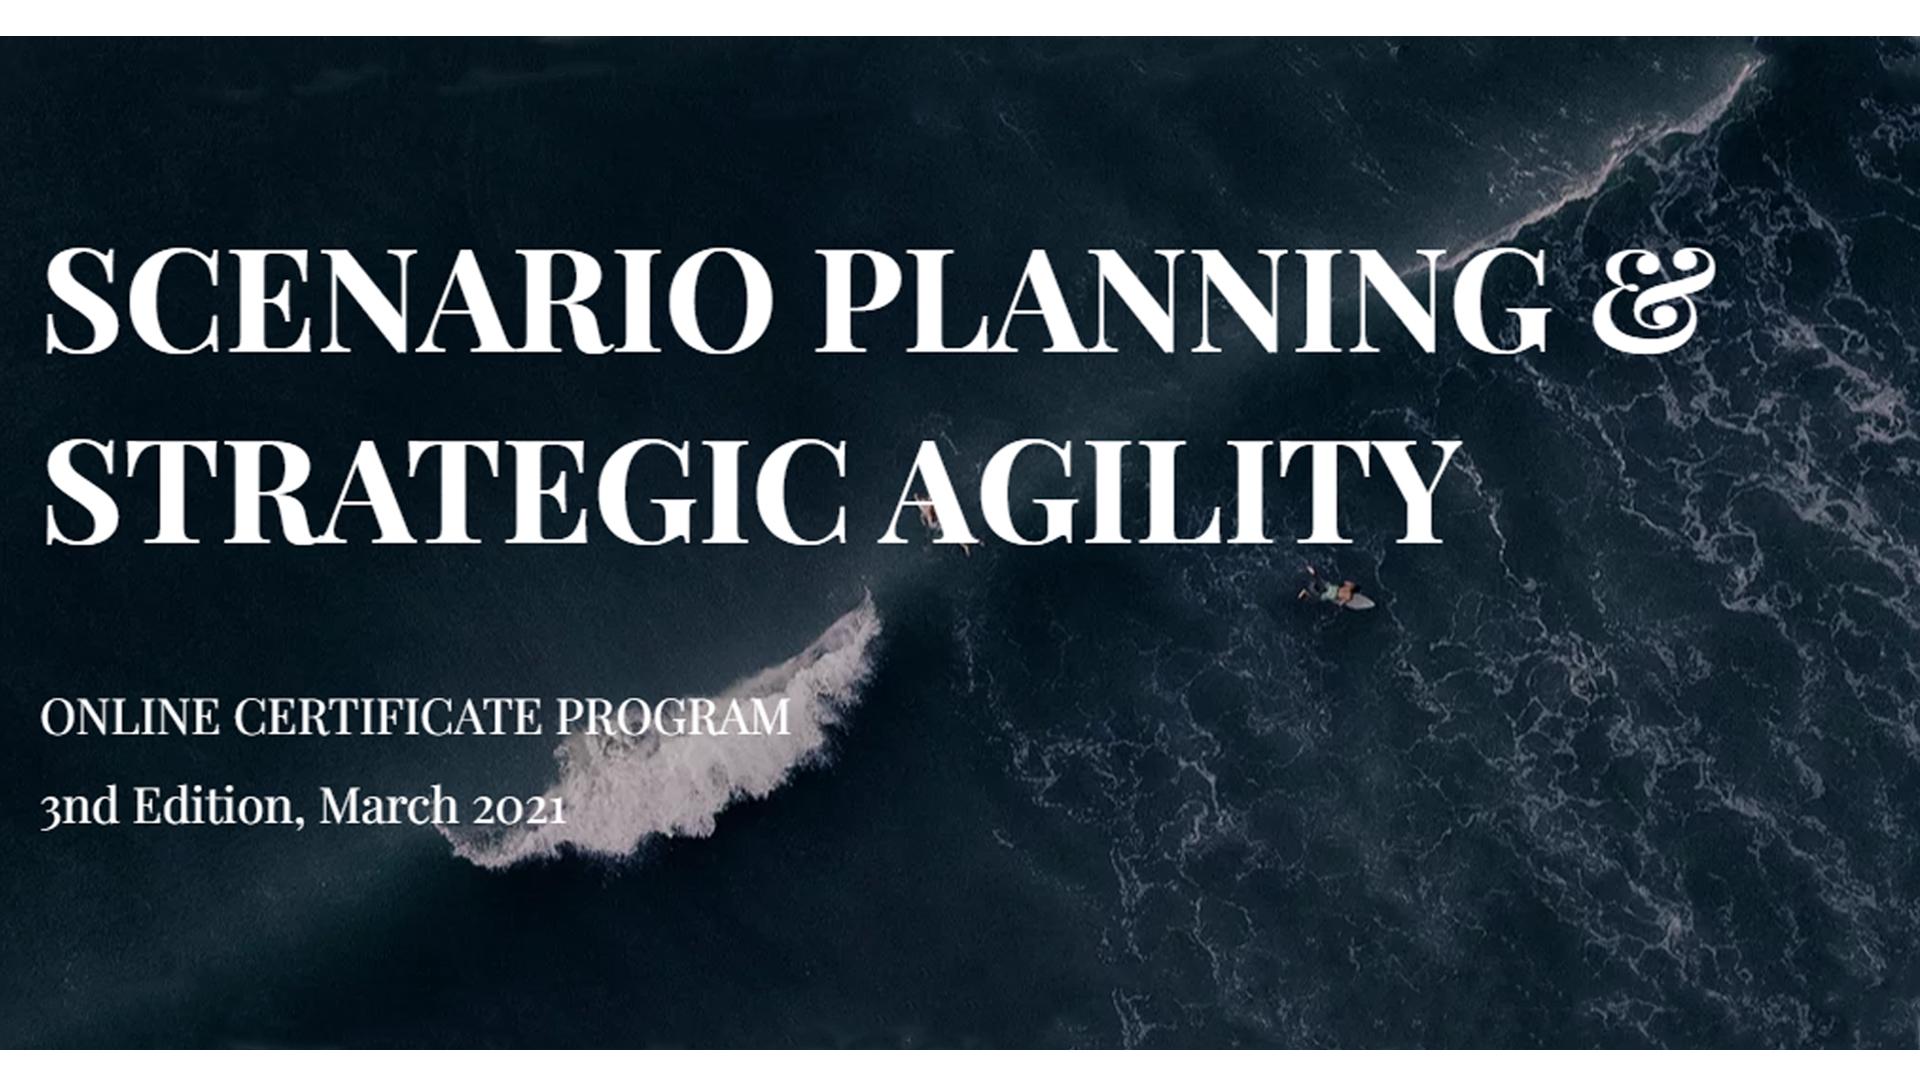 Scenario Planning & Strategic Agility - March 2021